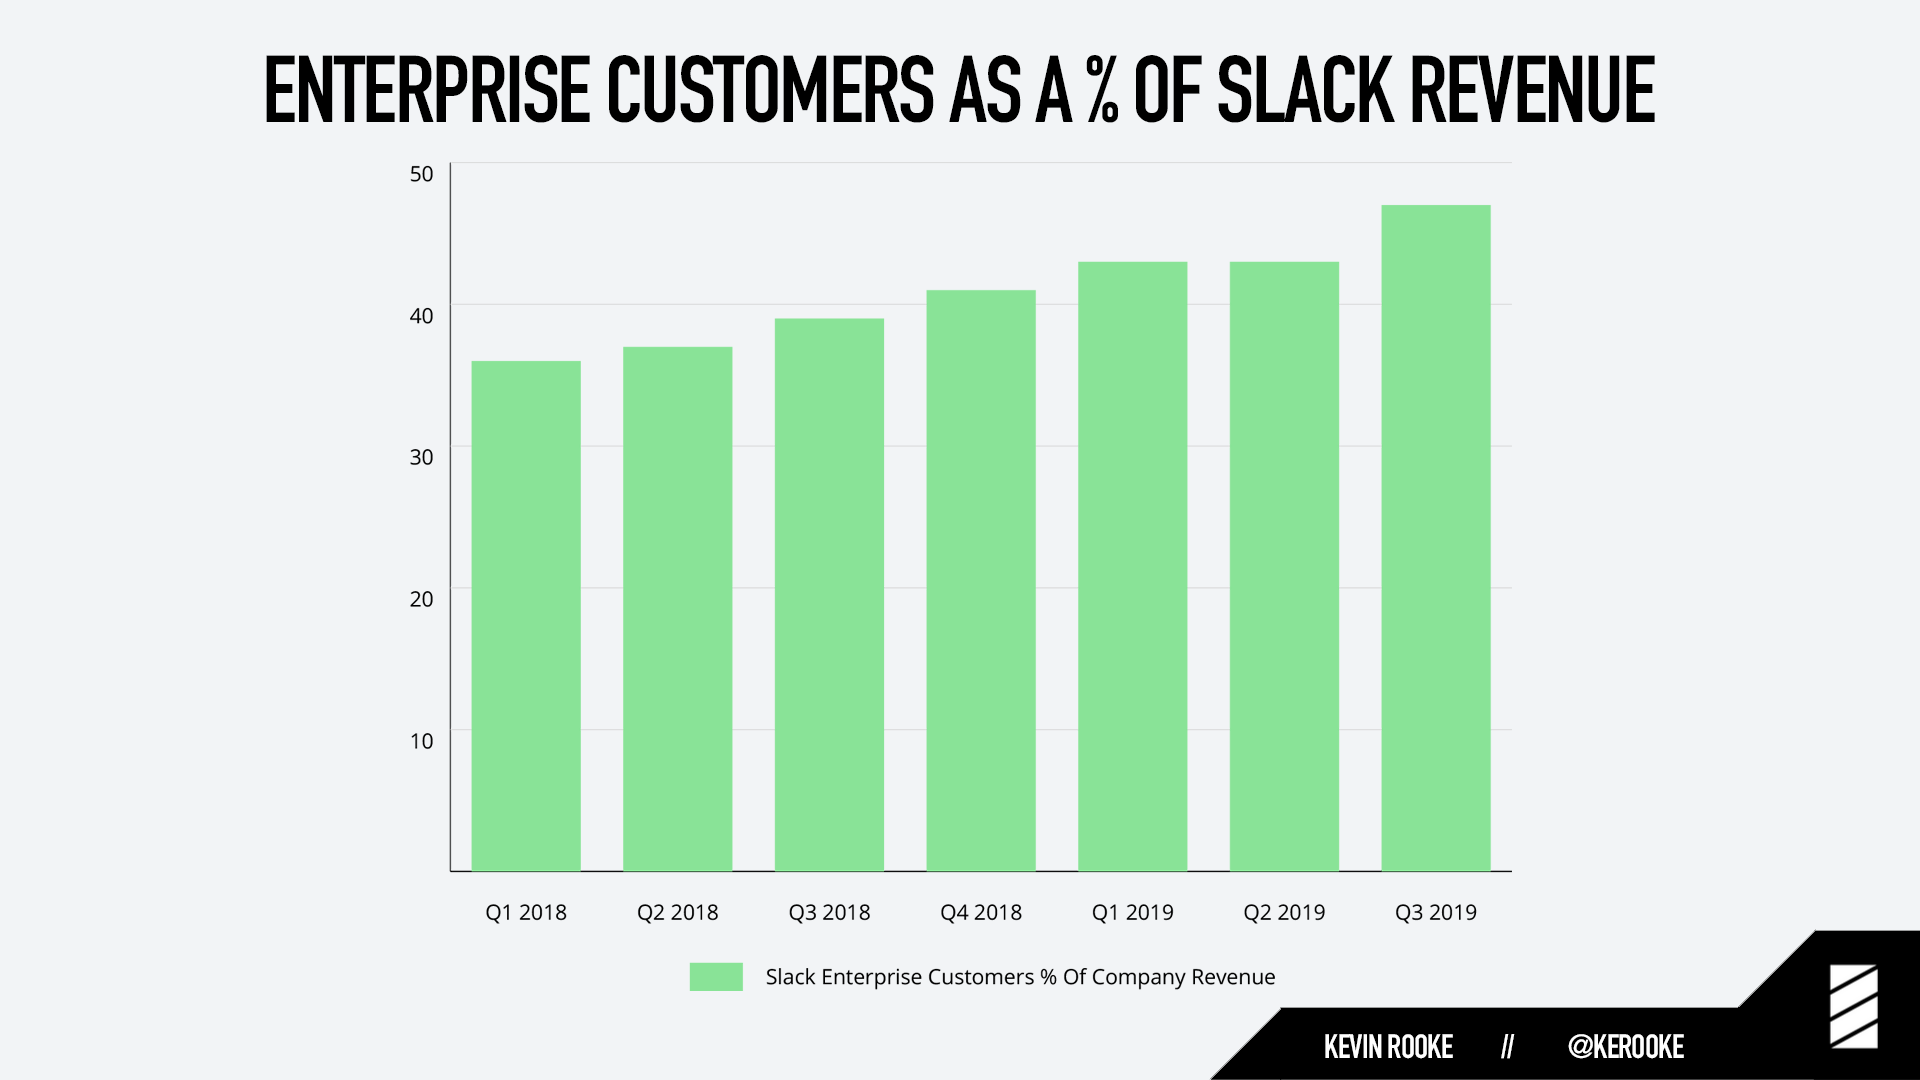 Enterprise customers as a % of Slack revenue.